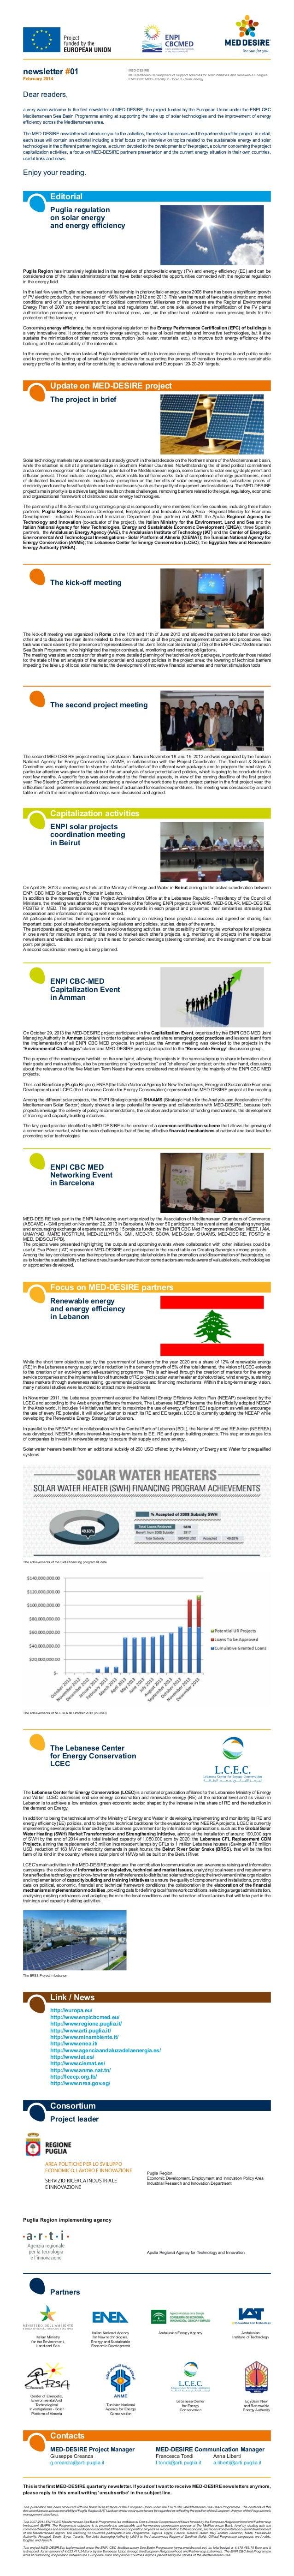 newsletter #01 February 2014 MED-DESIRE MEDiterranean DEvelopment of Support schemes for solar Initiatives and Renewable E...